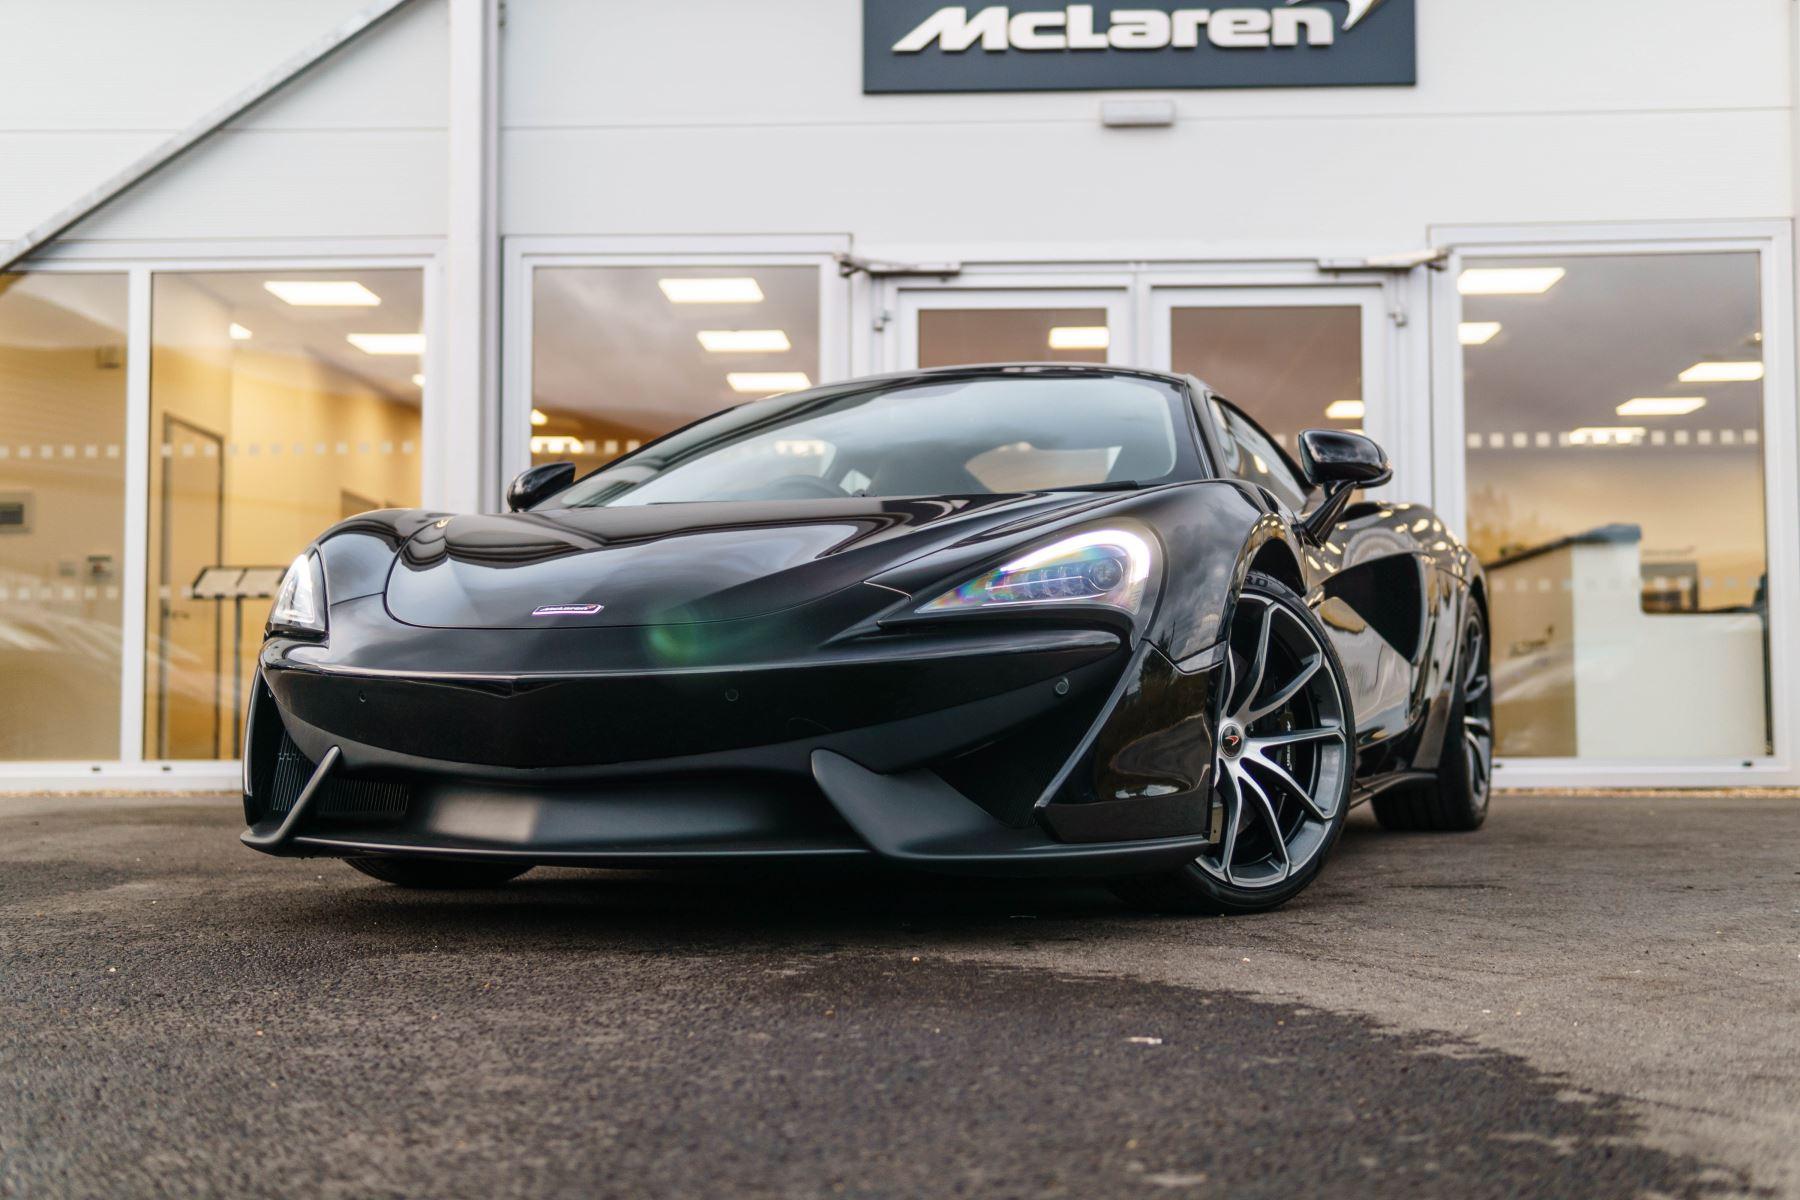 McLaren 540C V8 SSG 3.8 Automatic 2 door Coupe (16MY) image